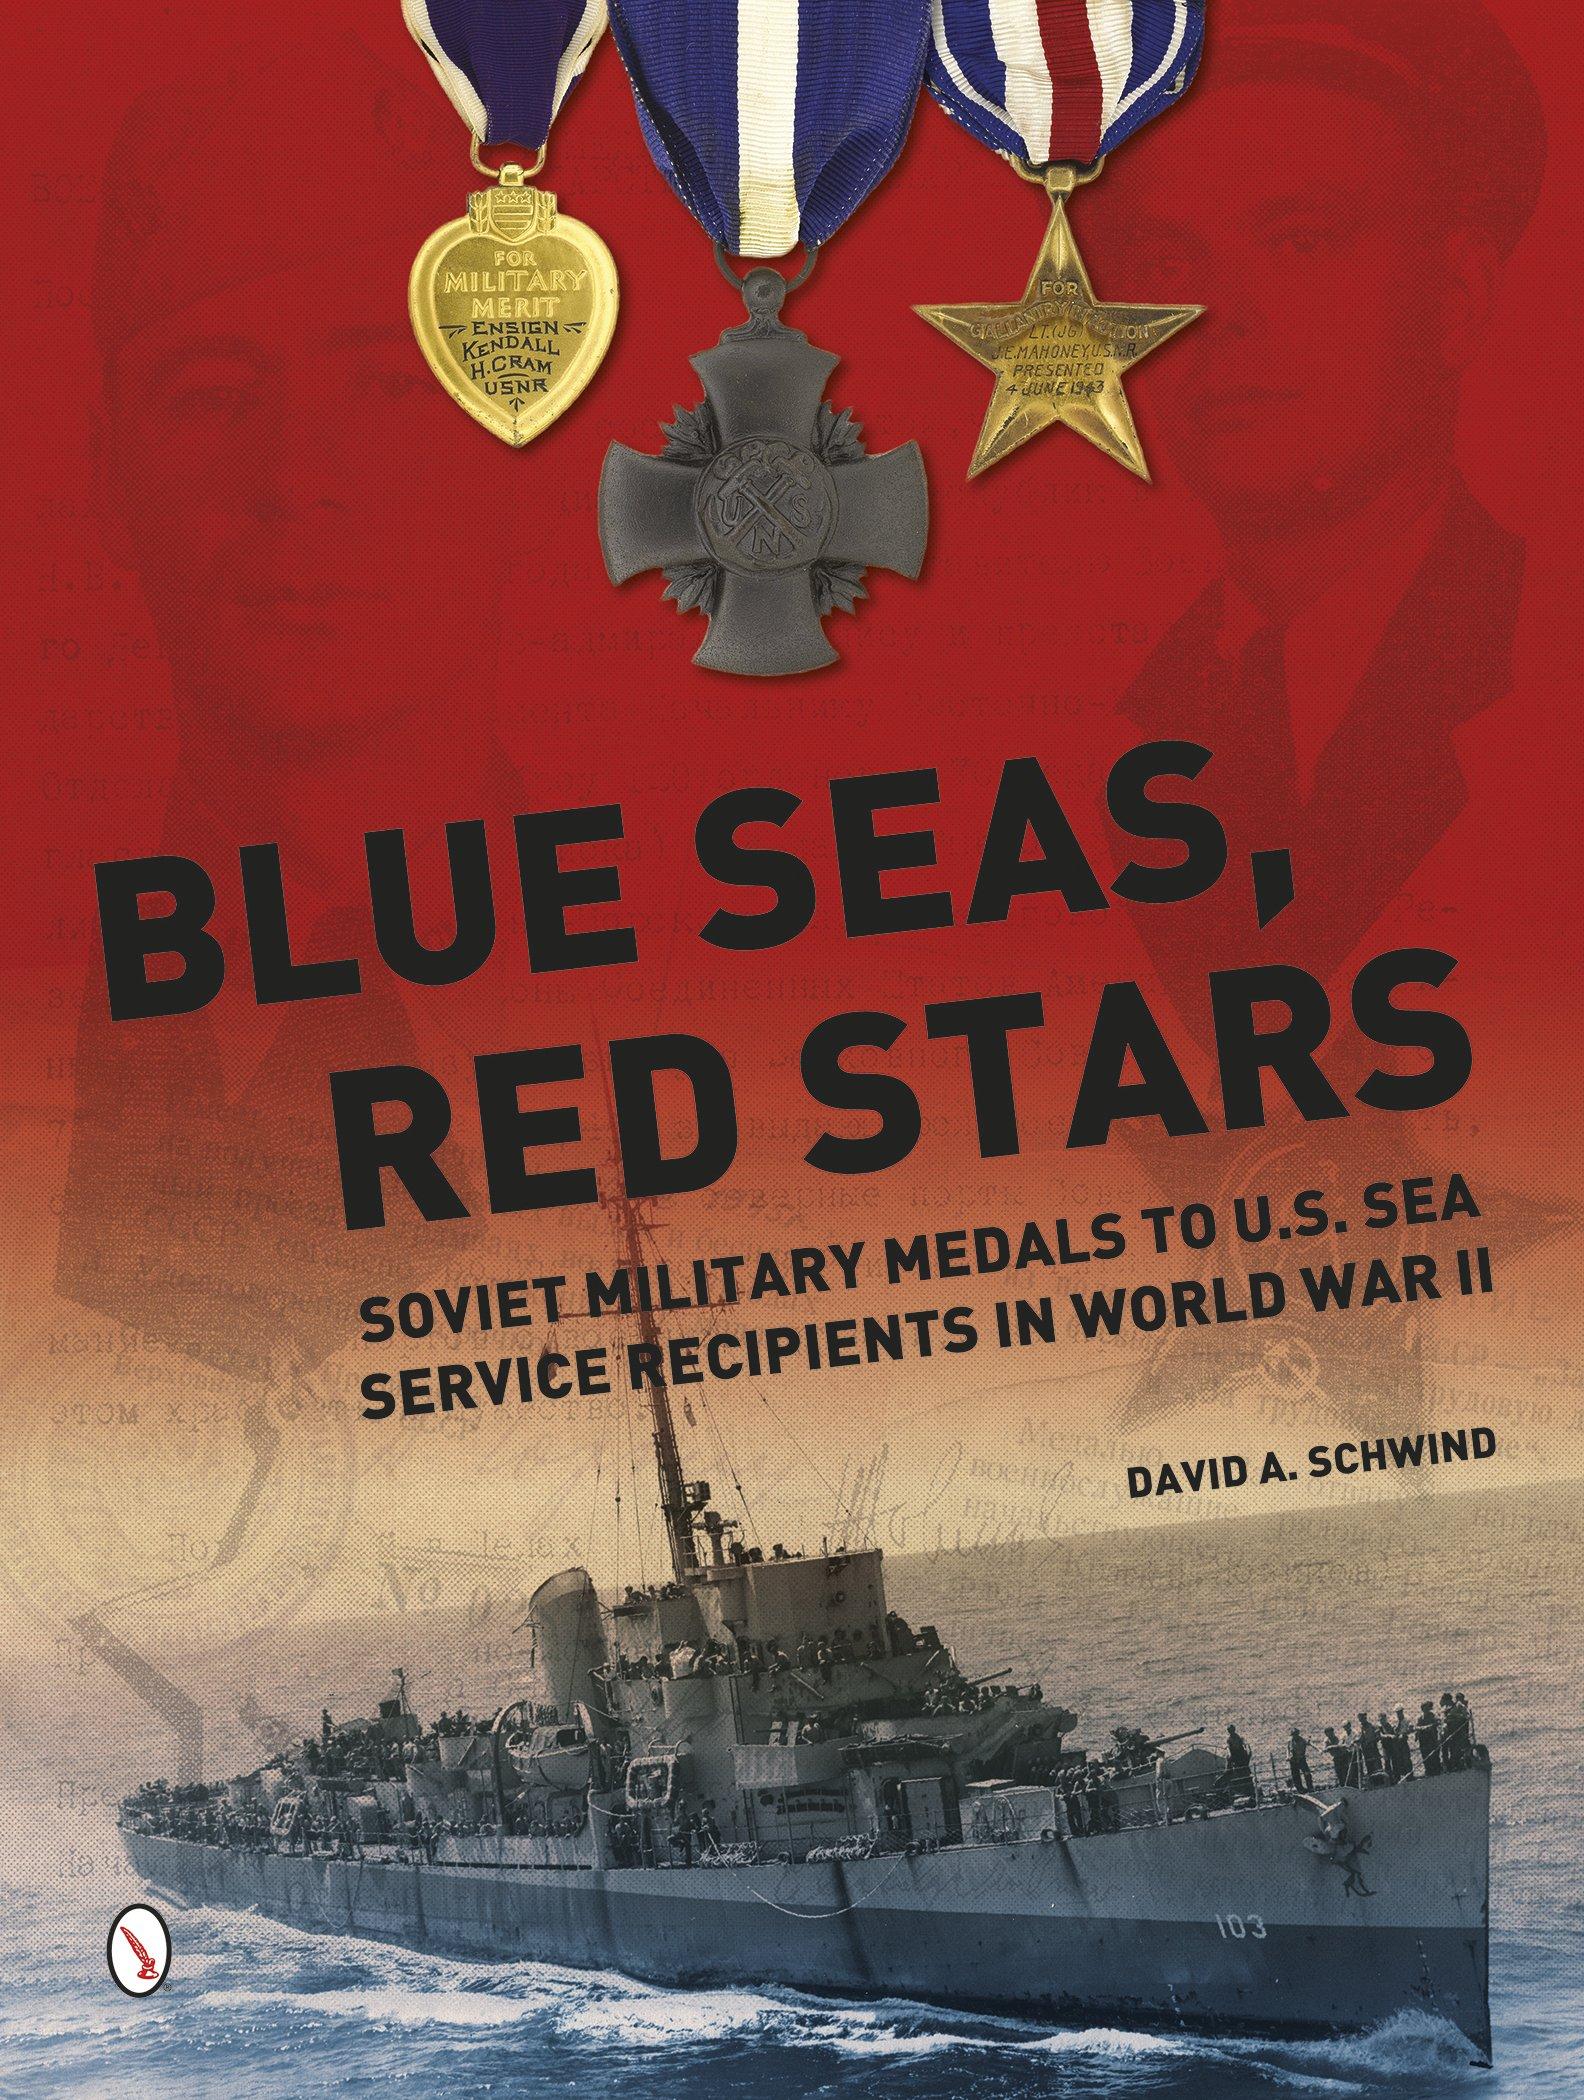 Download Blue Seas, Red Stars: Soviet Military Medals to U.S. Sea Service Recipients in World War II PDF